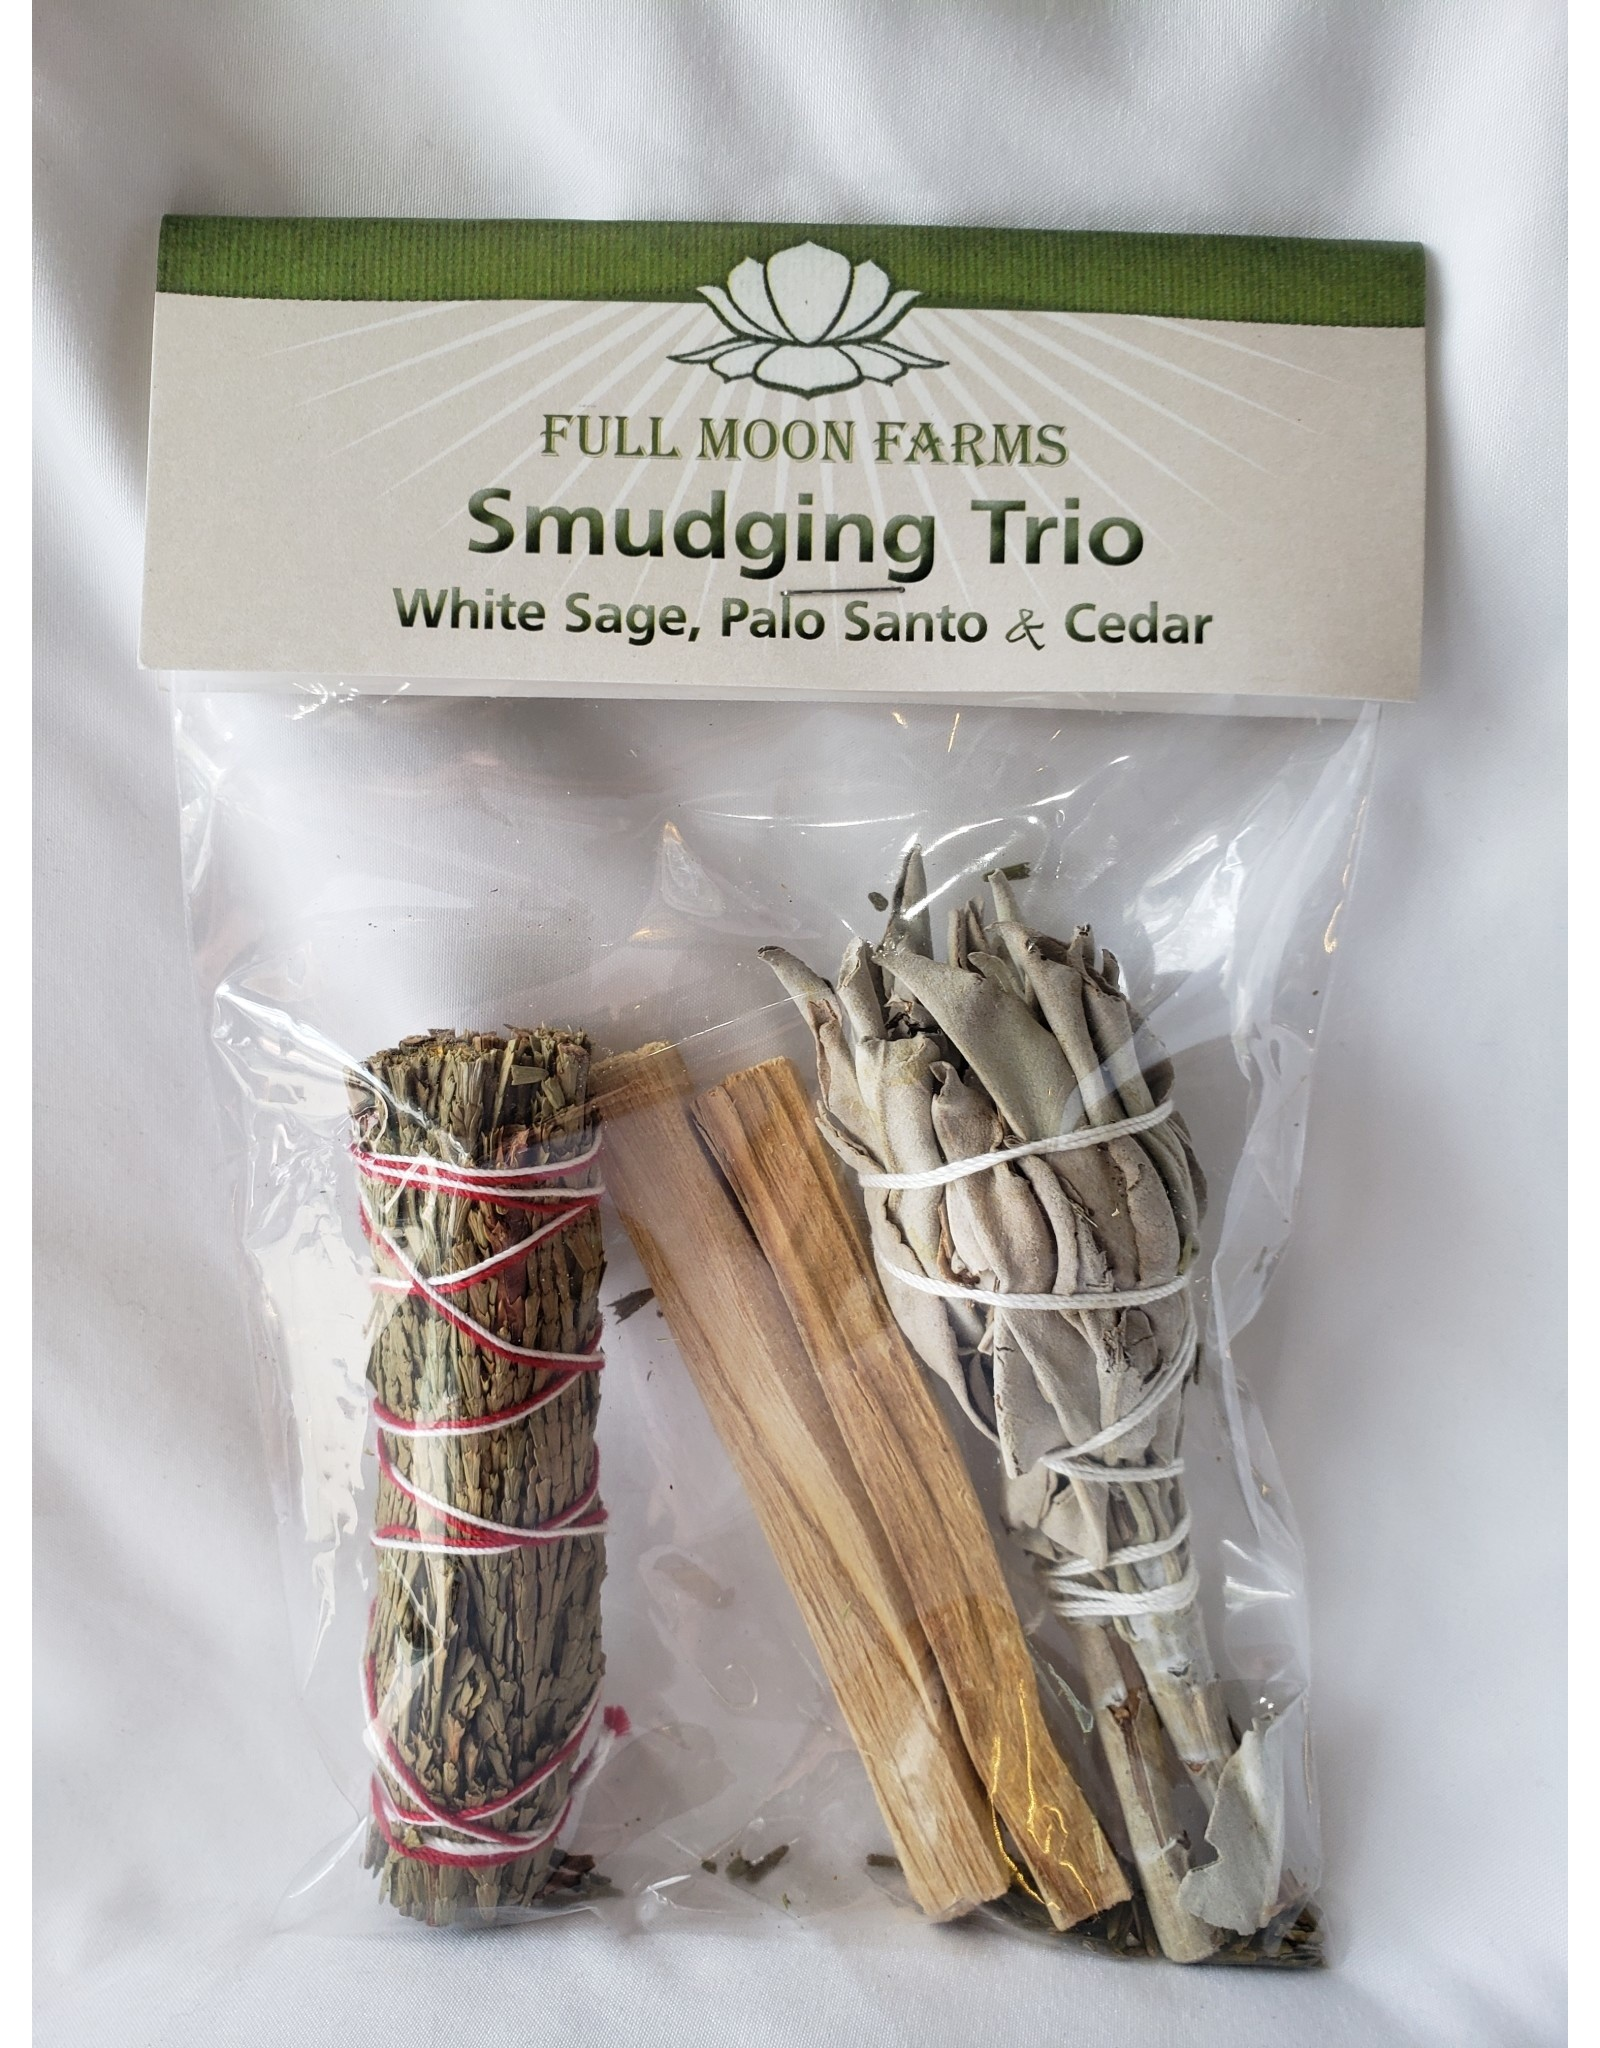 Full Moons Farms Smudging Trio | White Sage, Cedar & Palo Santo